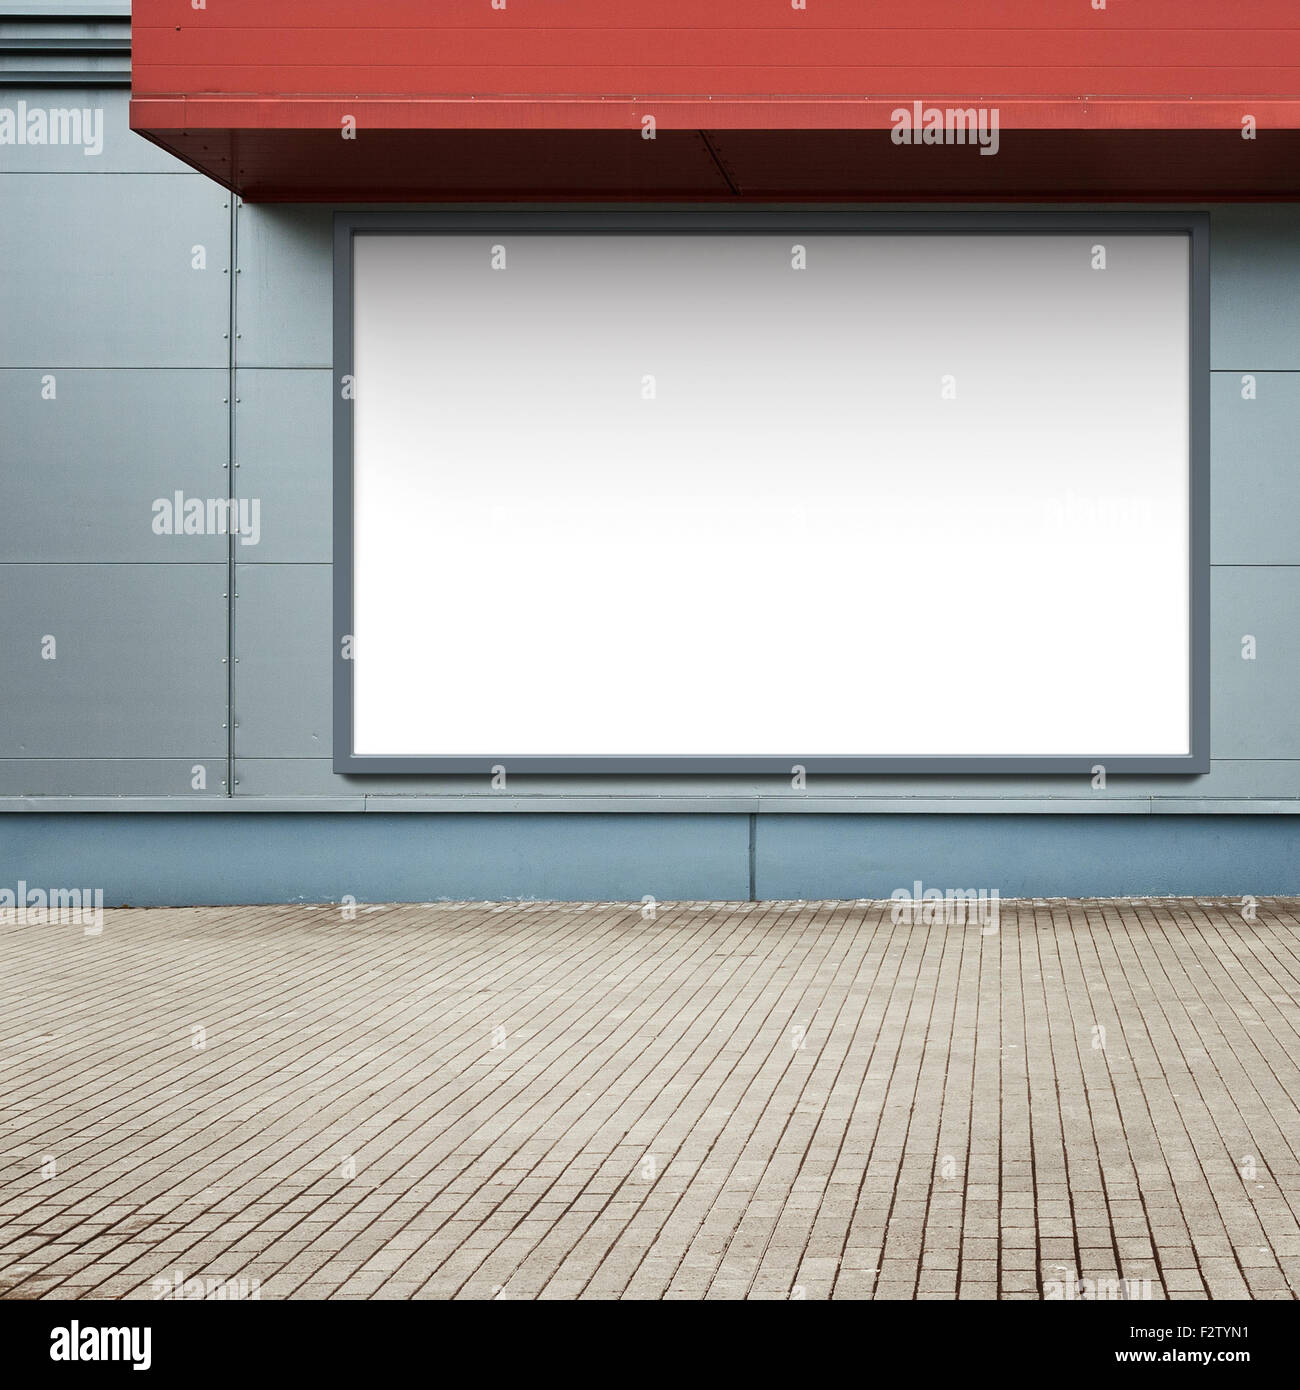 Blank advertising billboard on a street wall. - Stock Image